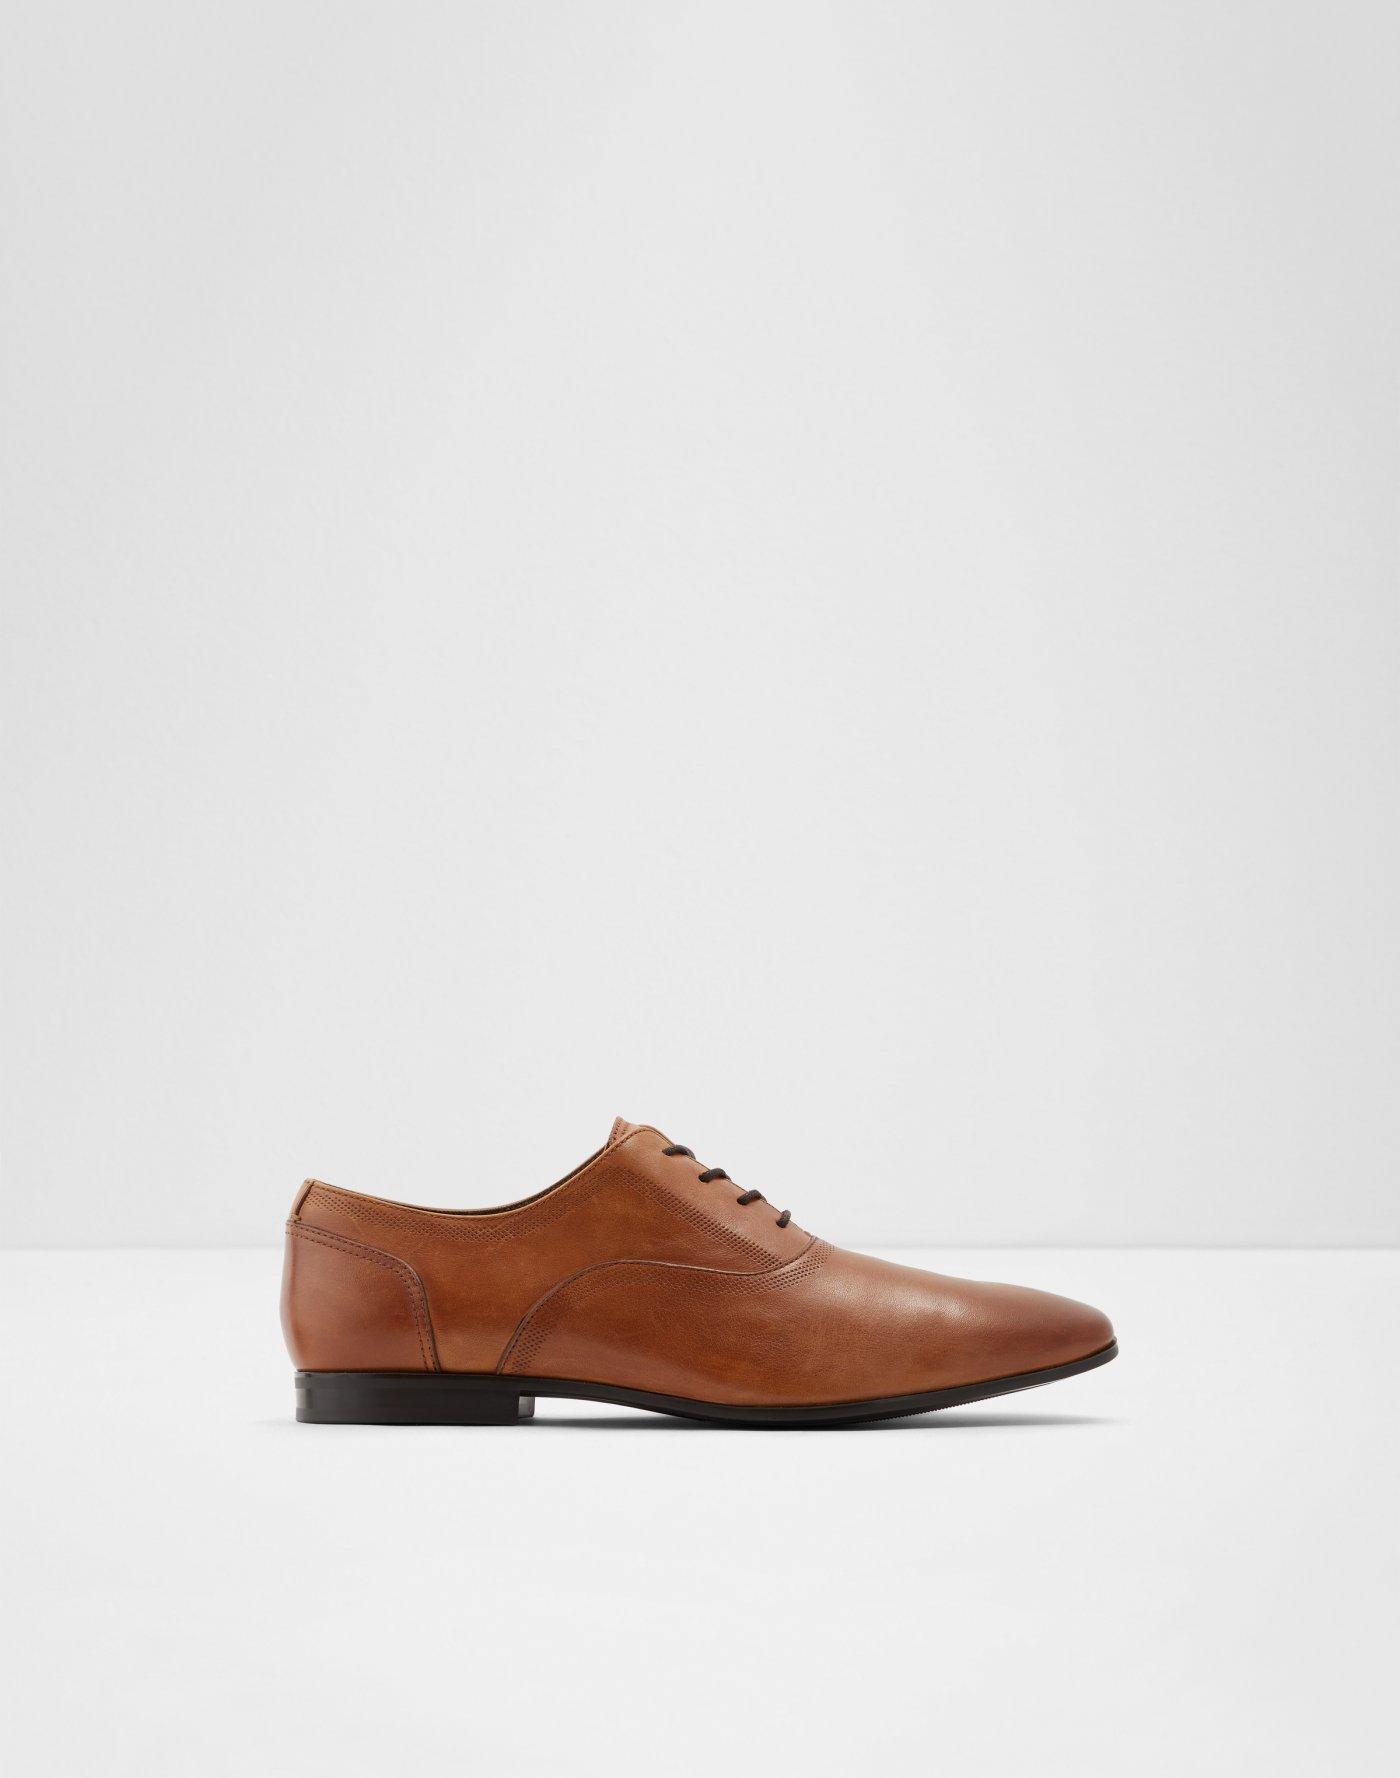 3be2ff20865e1 Men's Dress Shoes | Formal & Oxford Shoes For Men | ALDO US | Aldoshoes.com  US